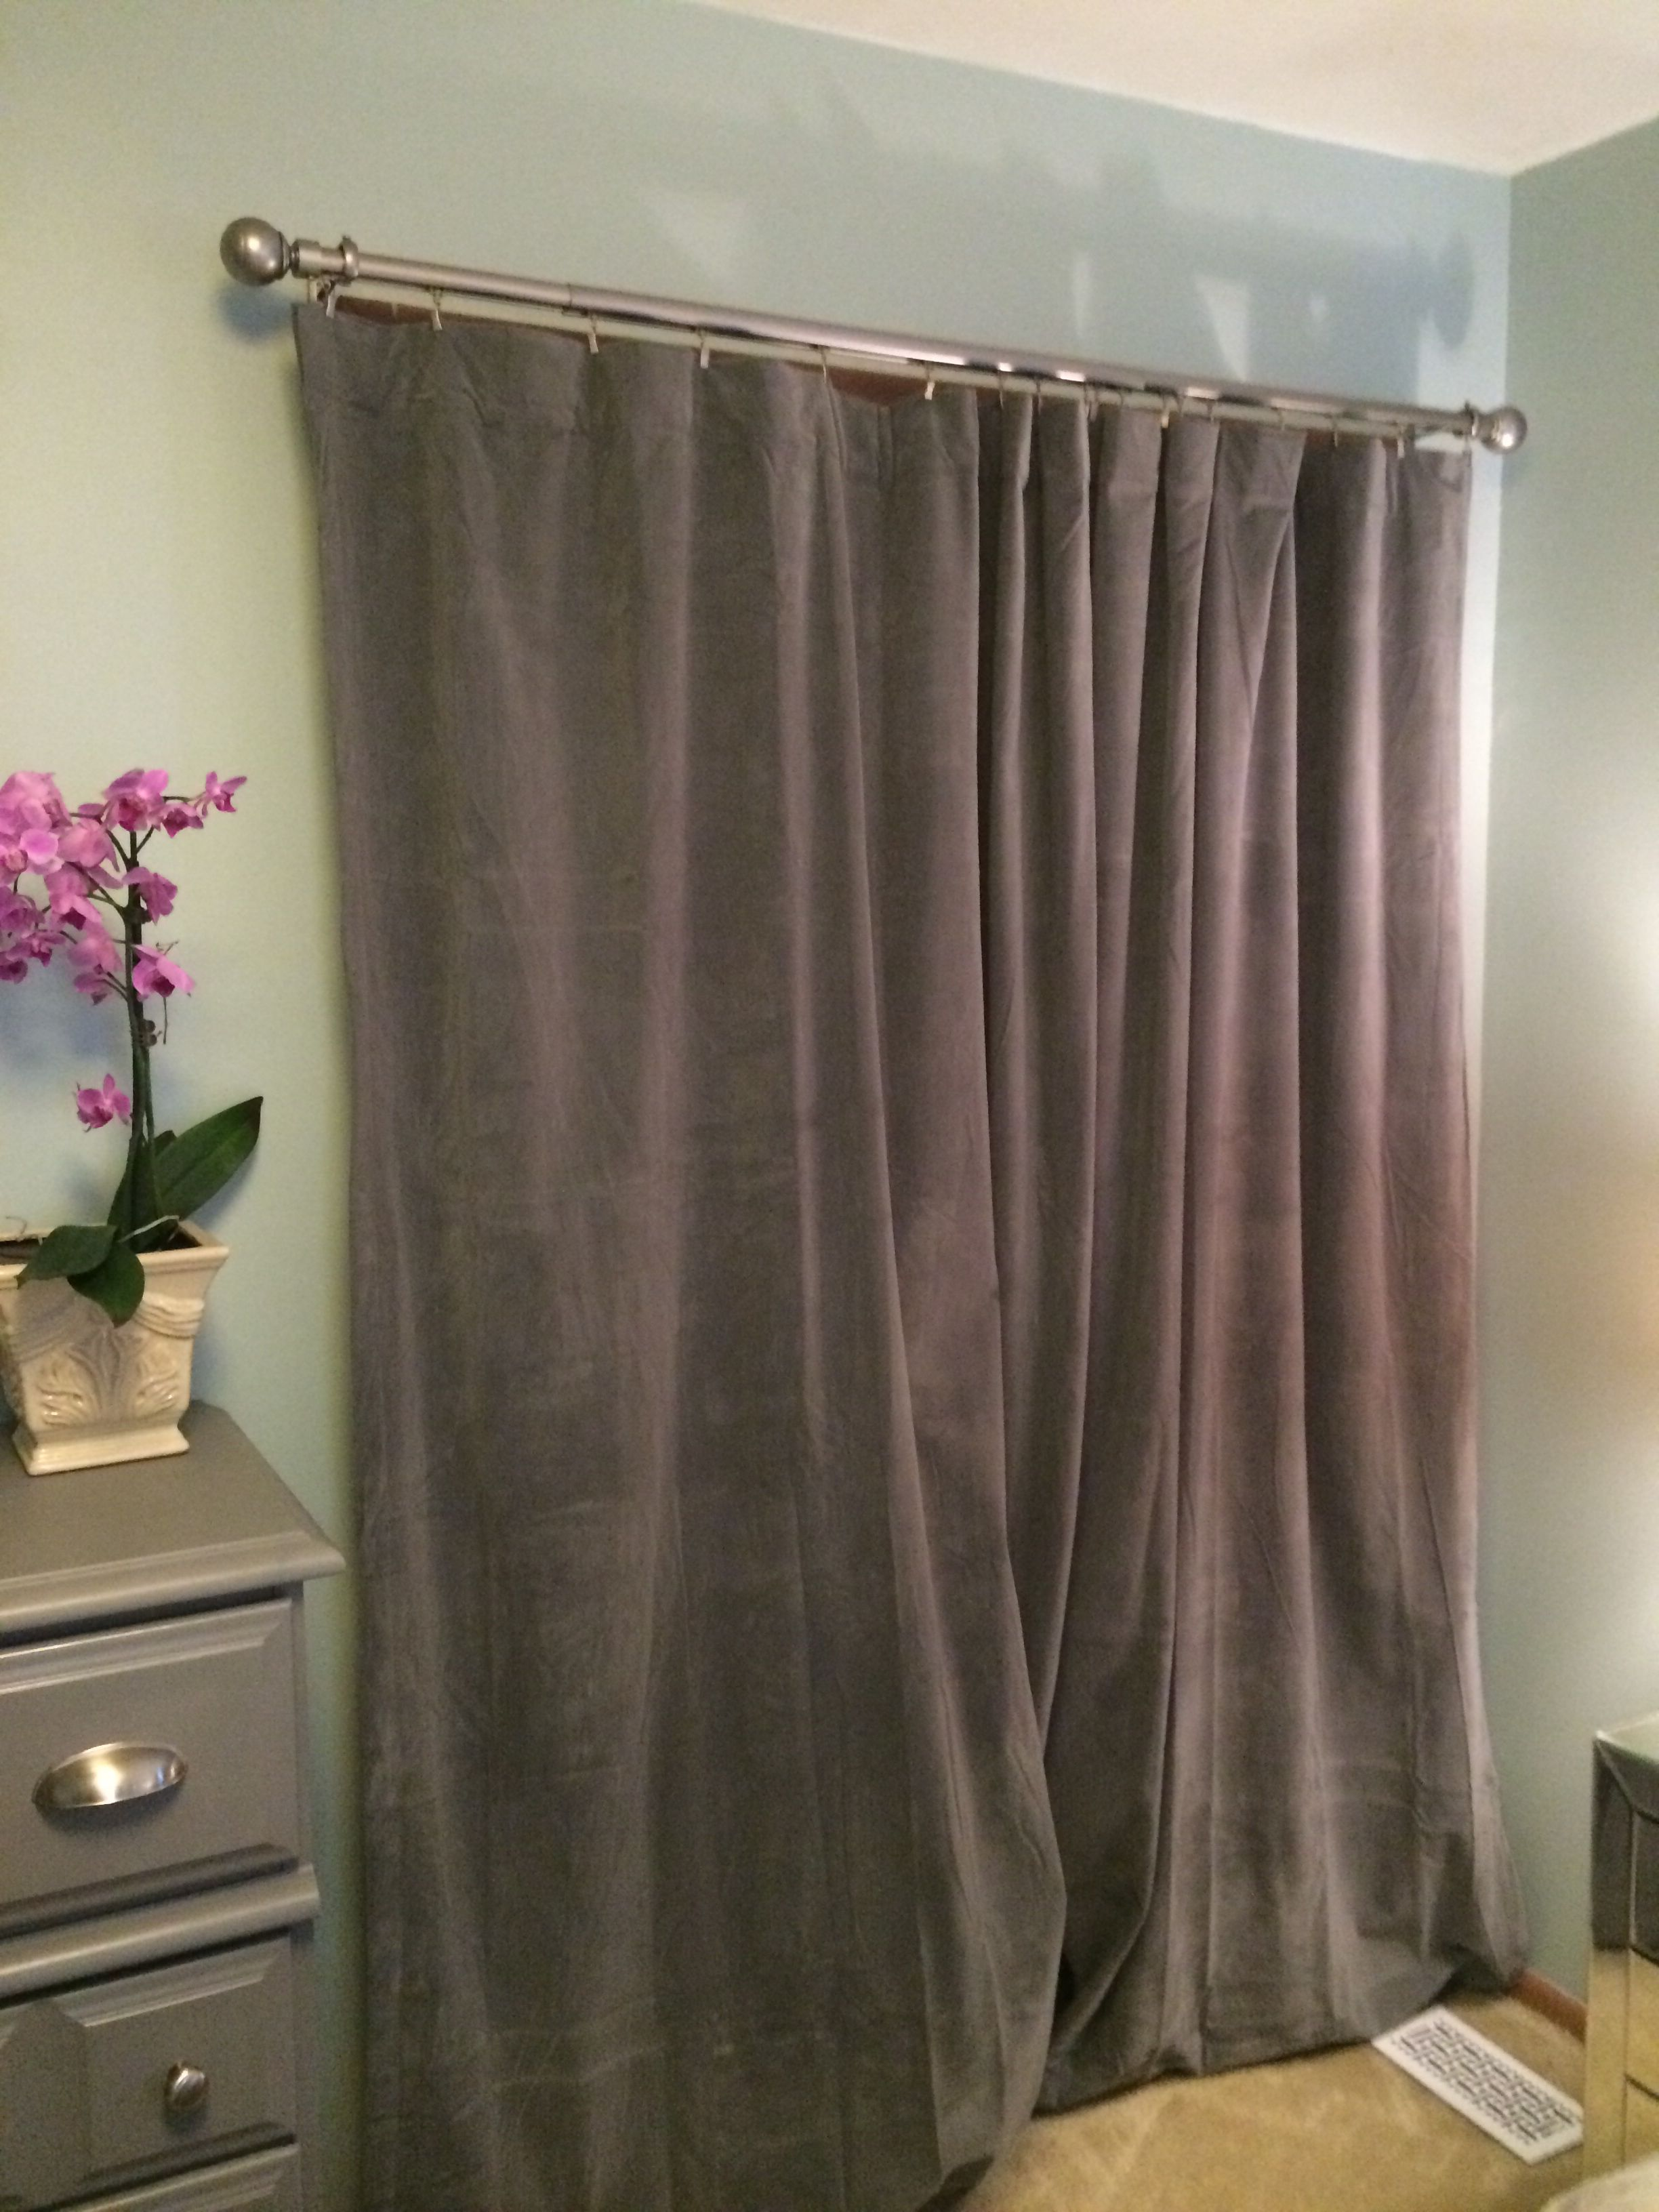 No more dated bi-fold closet doors! Chic grey velvet curtains ...